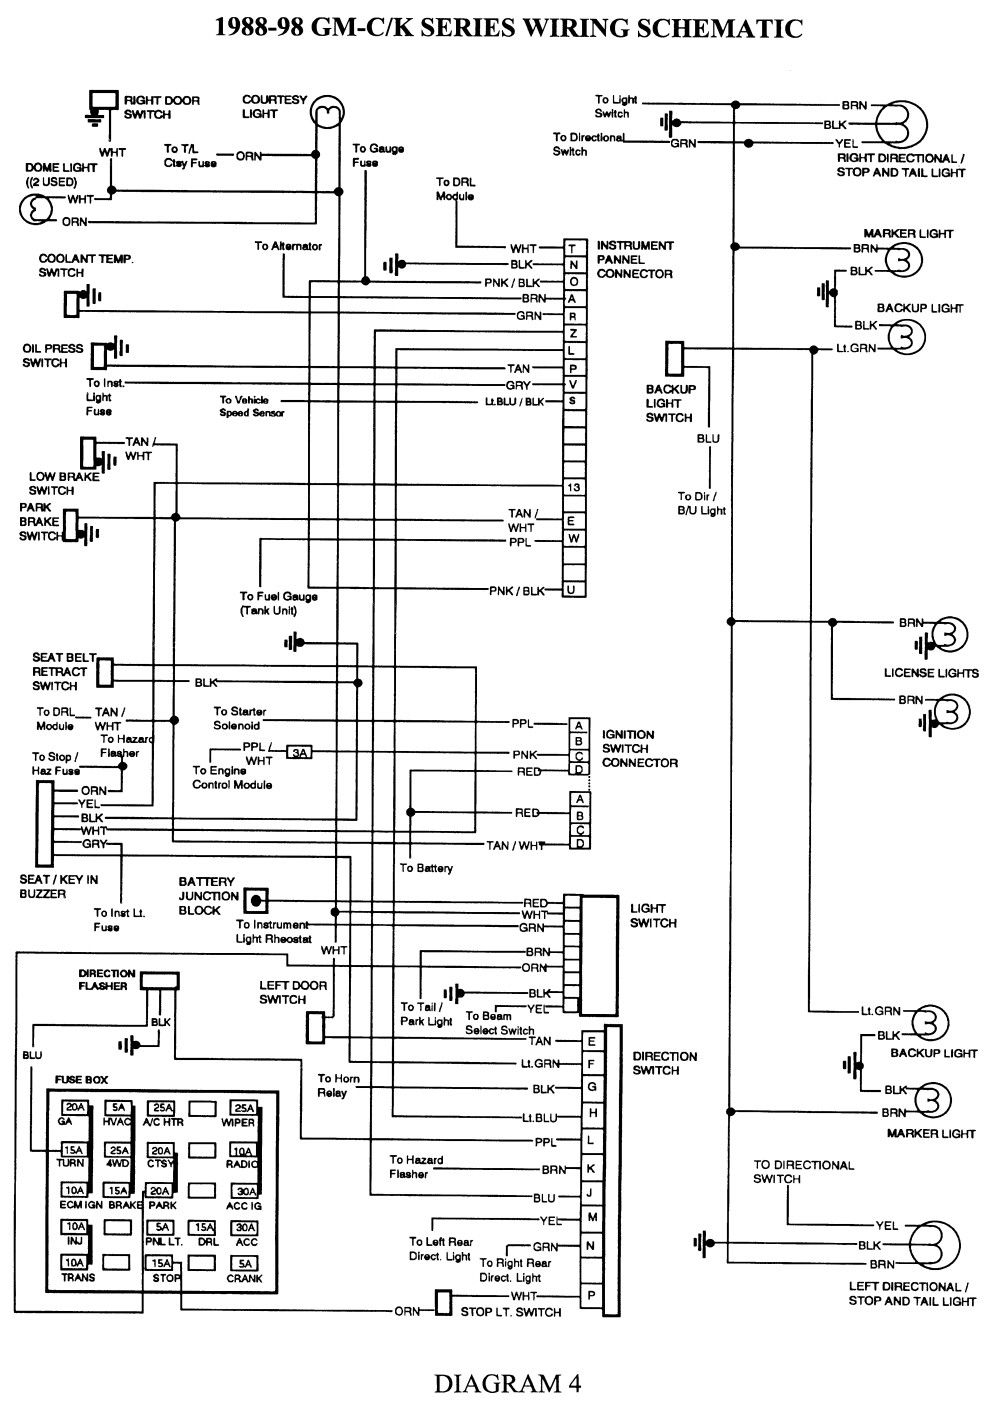 2001 F350 Wiring Diagram Rear Lights In 2020 Trailer Wiring Diagram Chevy 1500 Chevy Trucks